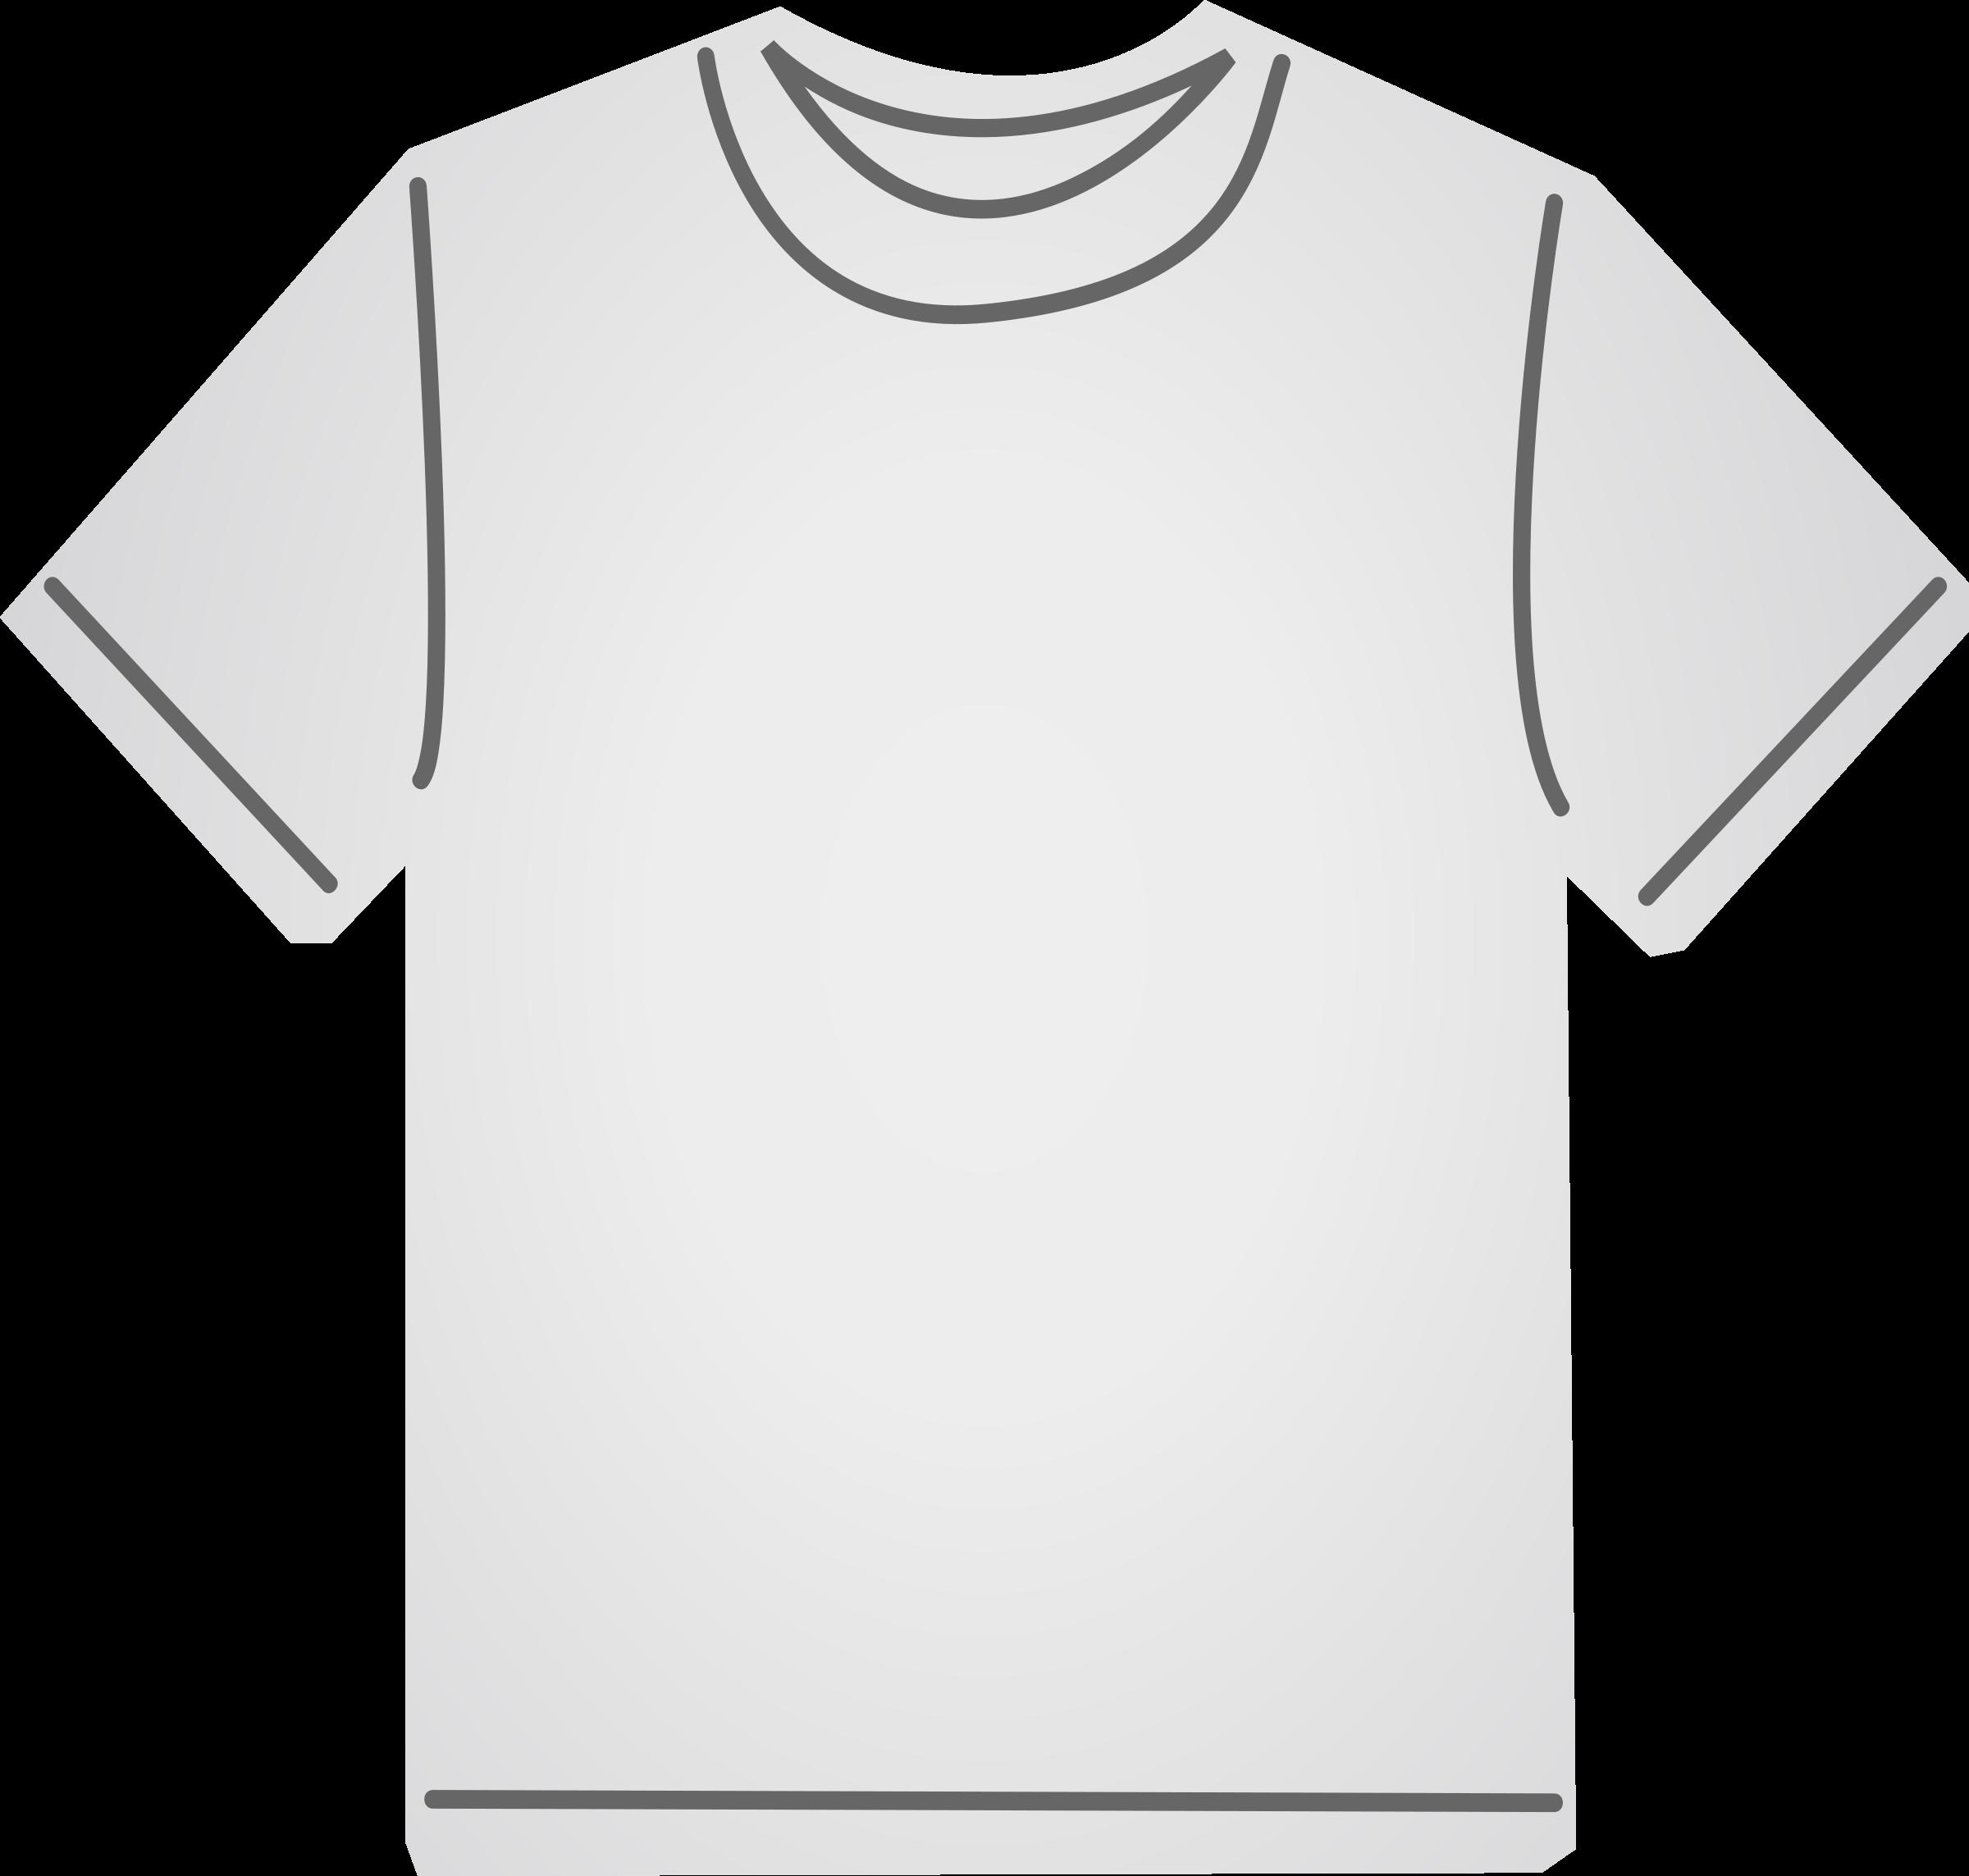 Gold clipart tshirt. T shirt white big